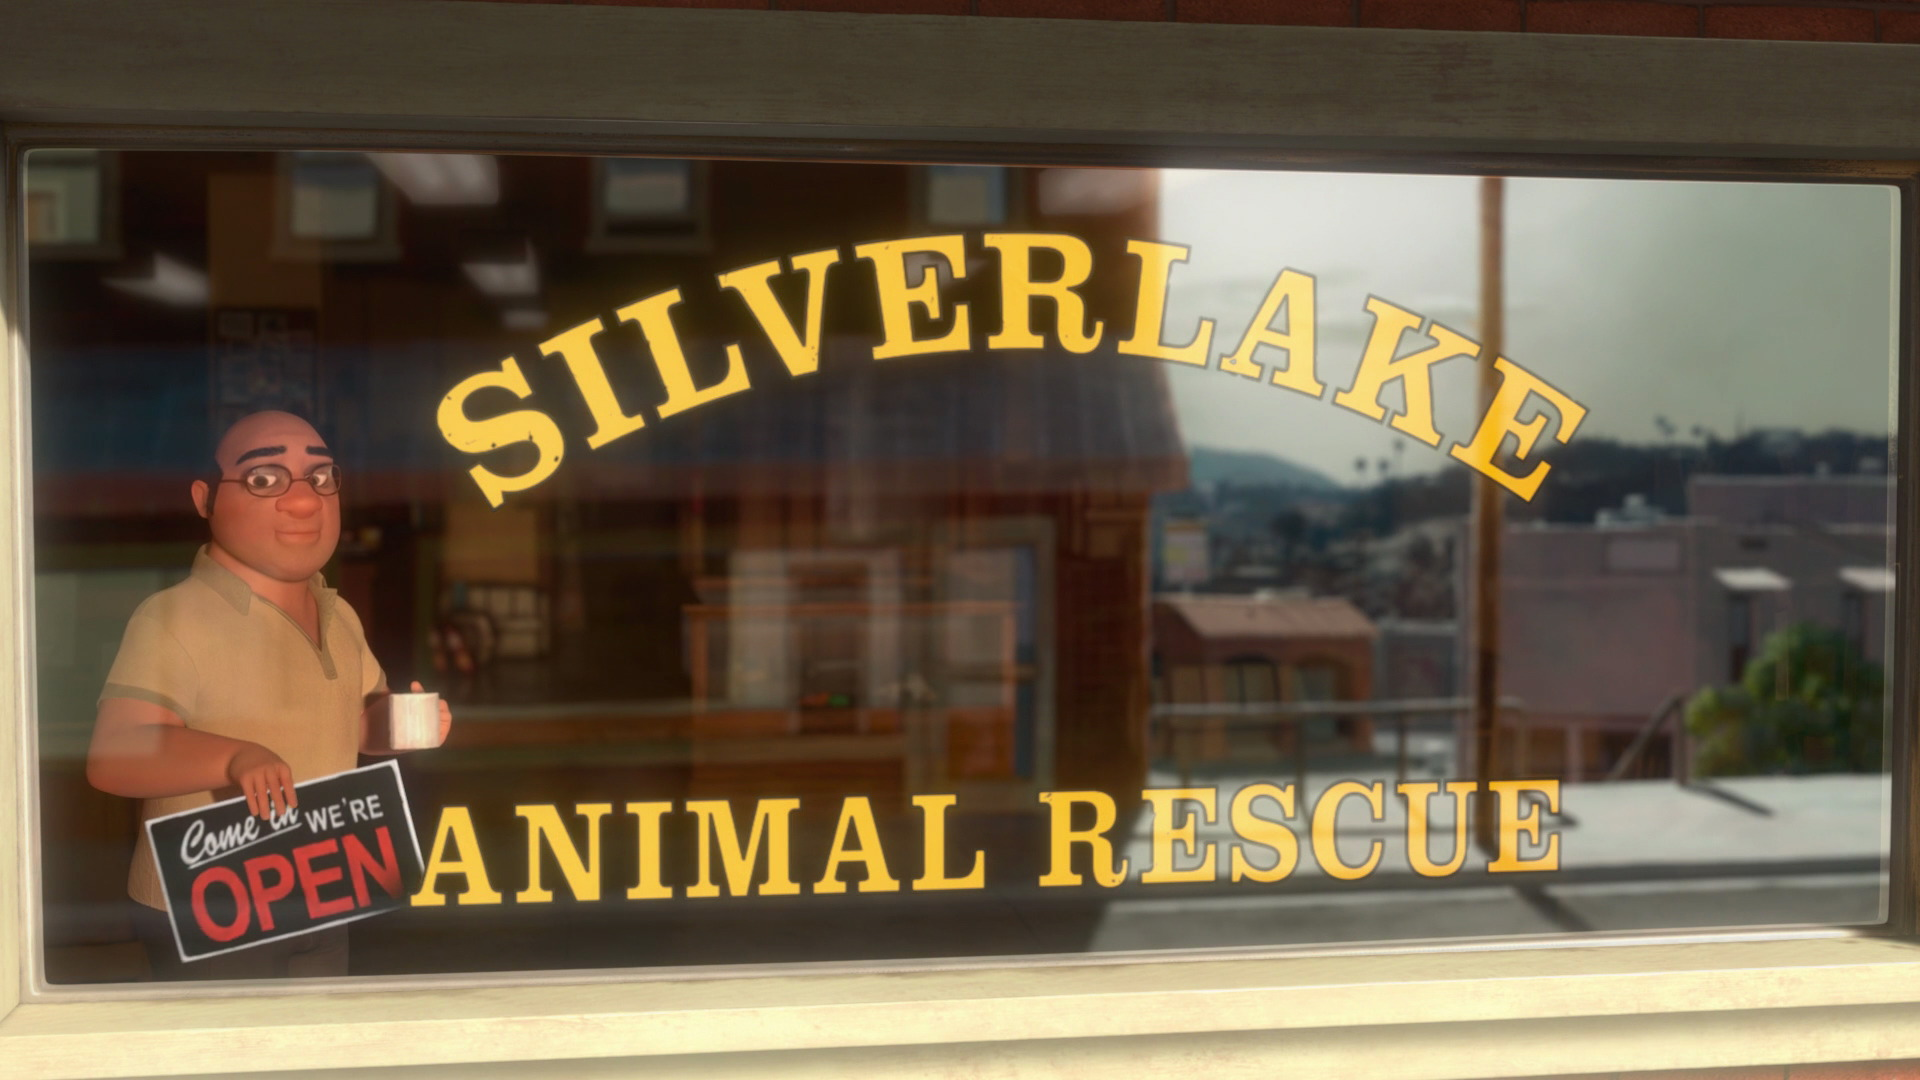 Silver Lake Animal Rescue